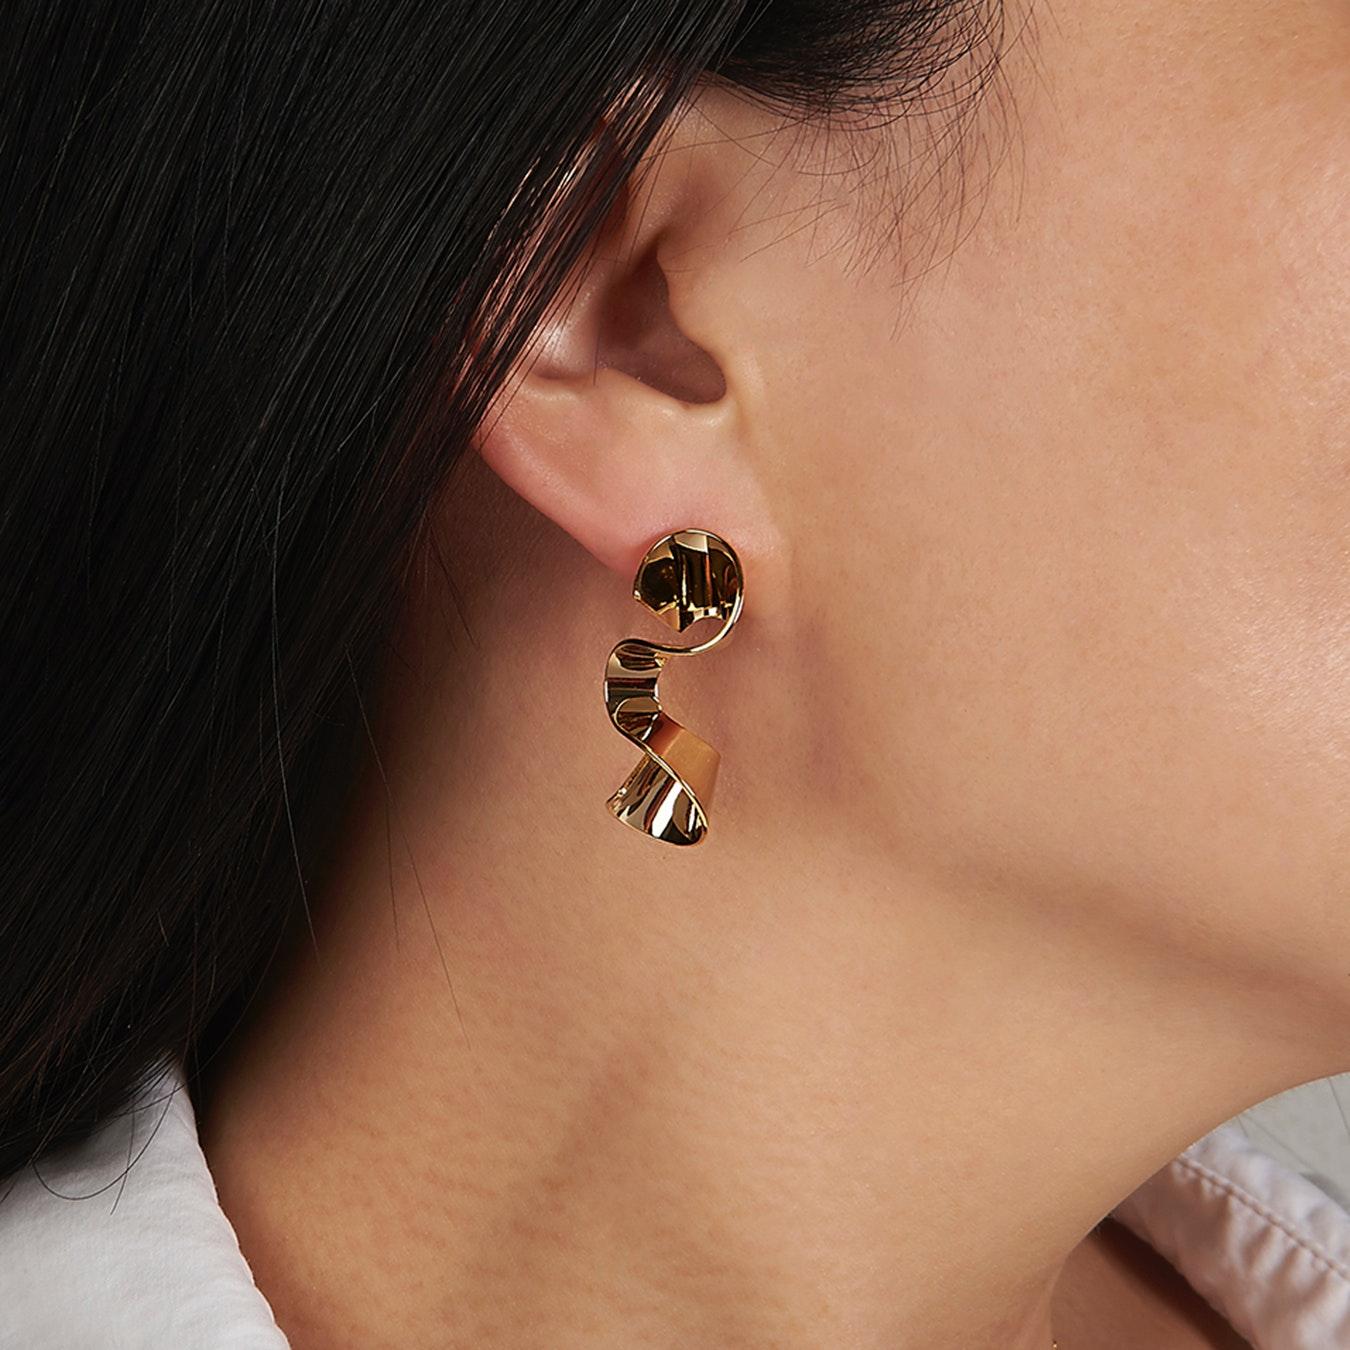 99fad5972 Sleek Gold Wave Stud Earrings by DOSE of ROSE - Fy